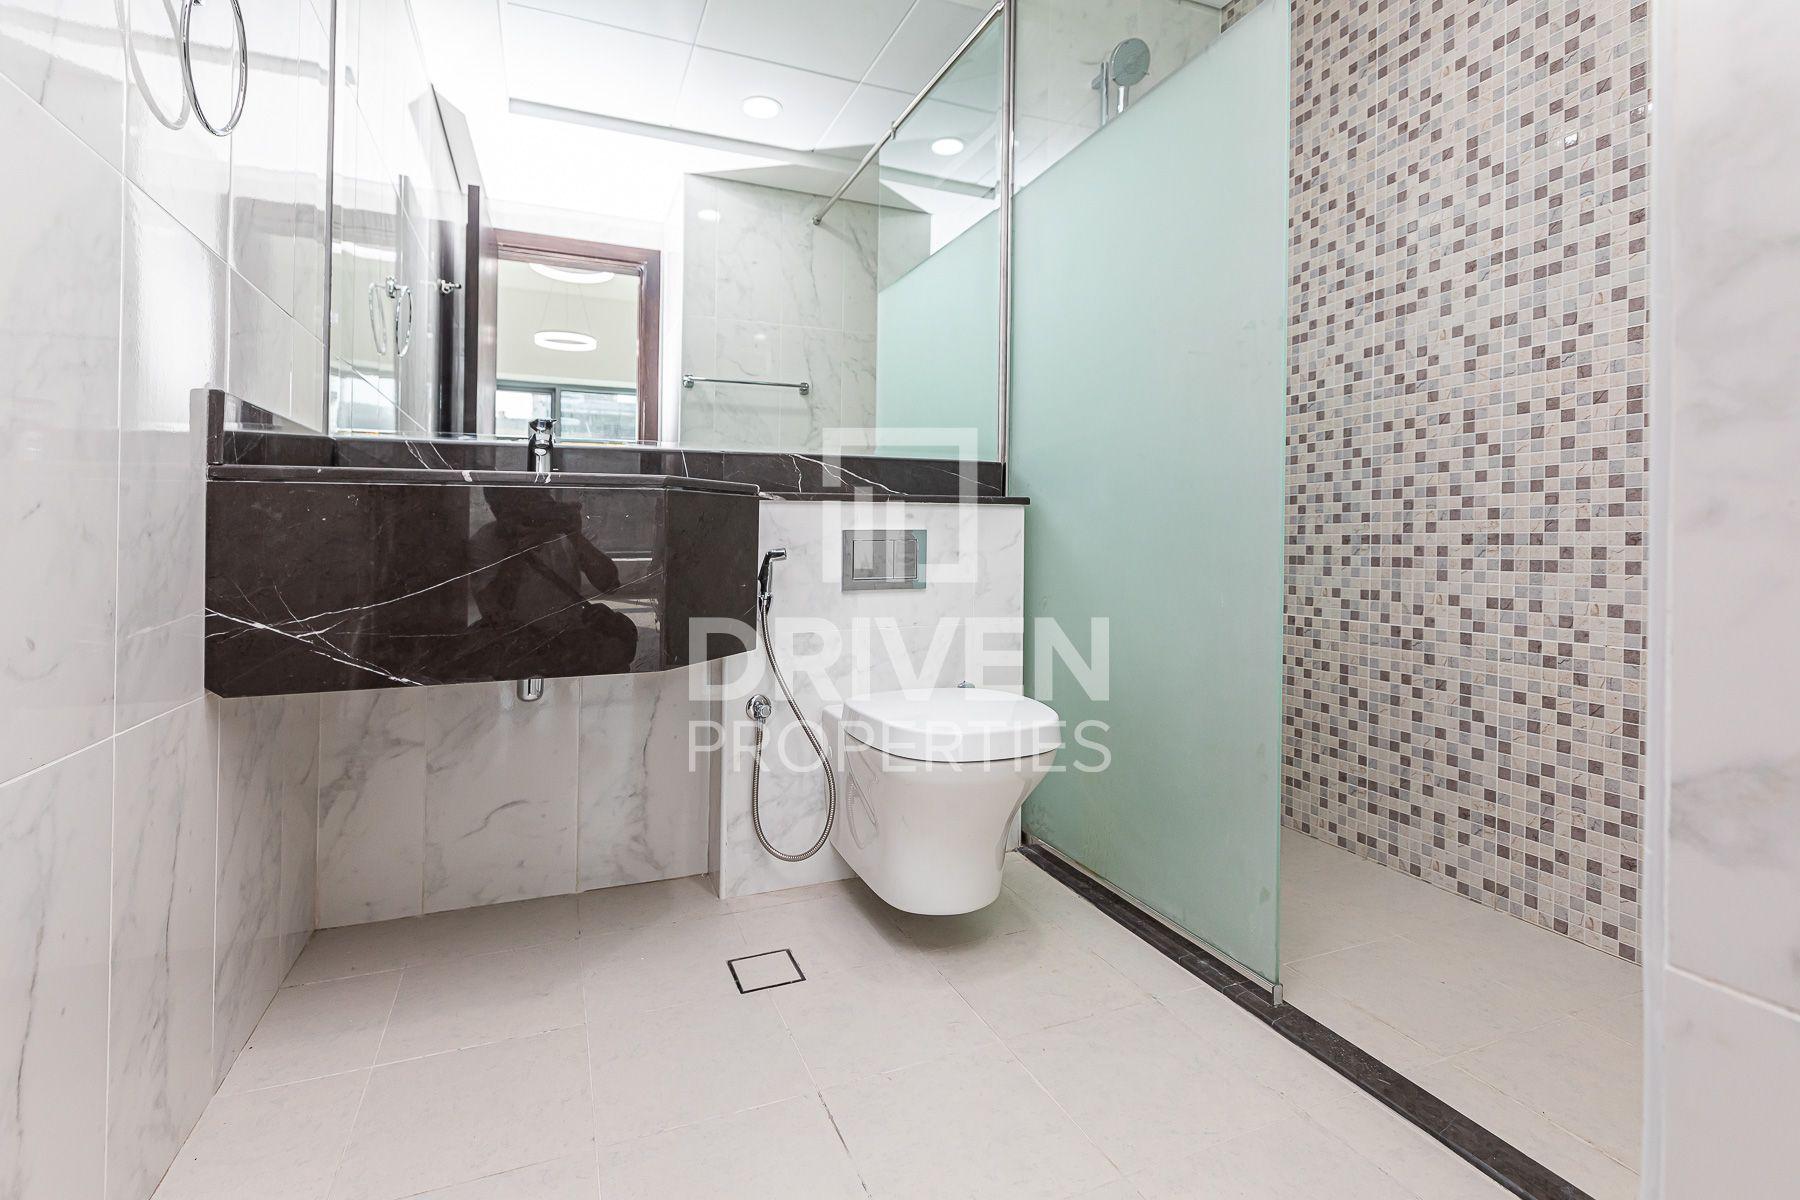 Apartment for Rent in Adaire 2 - Al Satwa